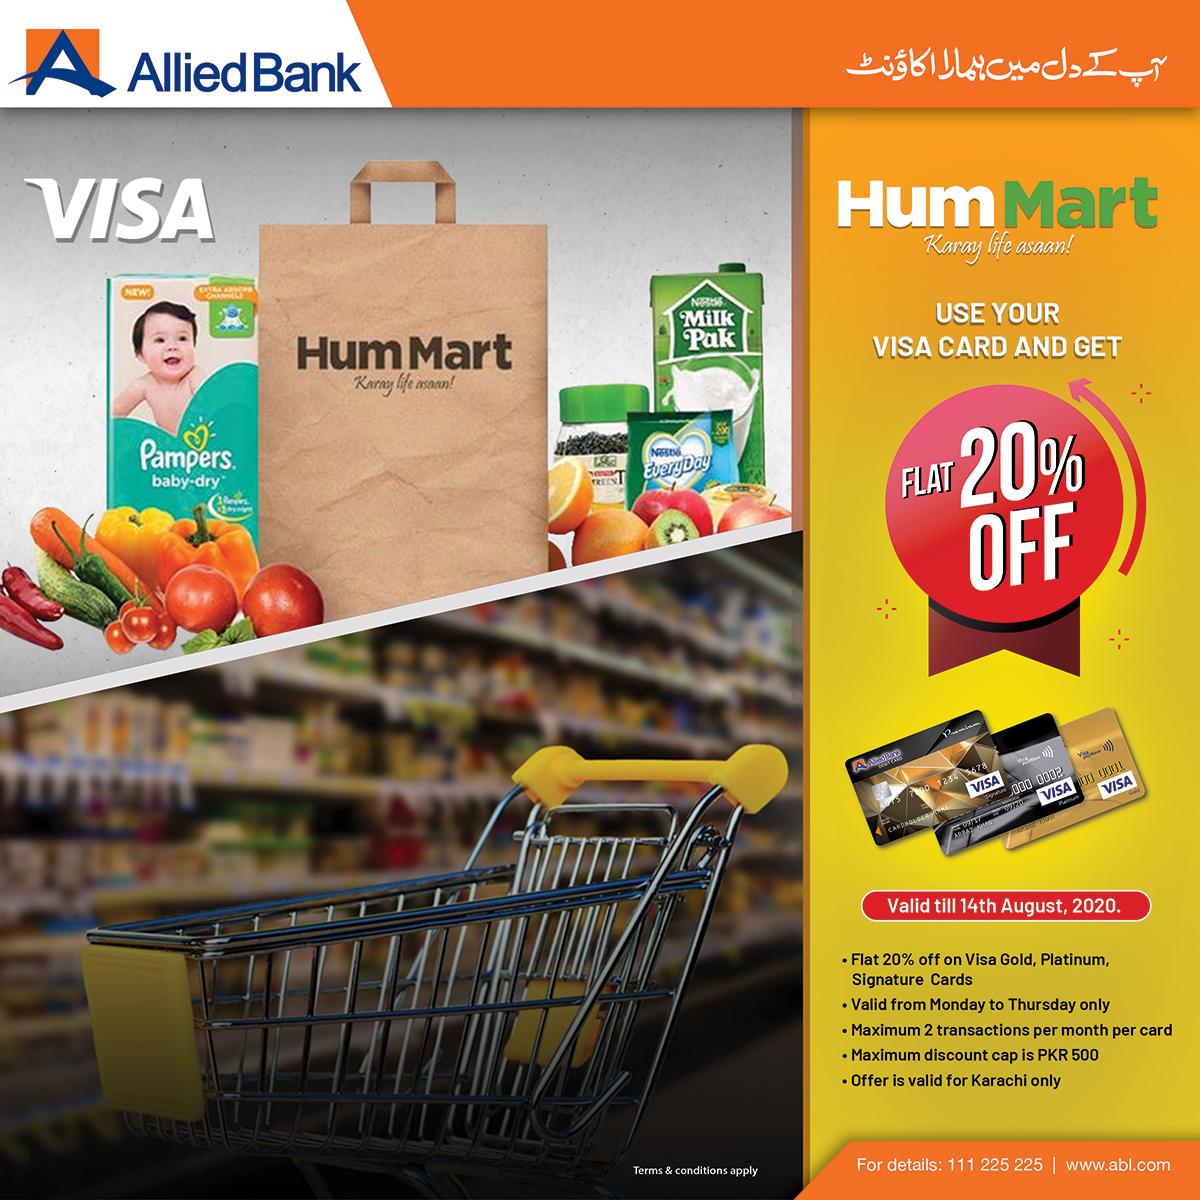 Karachiites can now avail flat 20% discount with ABLs VISA Gold Credit card, VISA Platinum Credit card & VISA Premium Debit card.  Terms & Conditions apply. For details: https://t.co/Njcqgo67BW  #cardoffers #ABLDiscounts #CardDiscount #Discounts #DebitCard #CreditCard https://t.co/6KEFtbcRVp